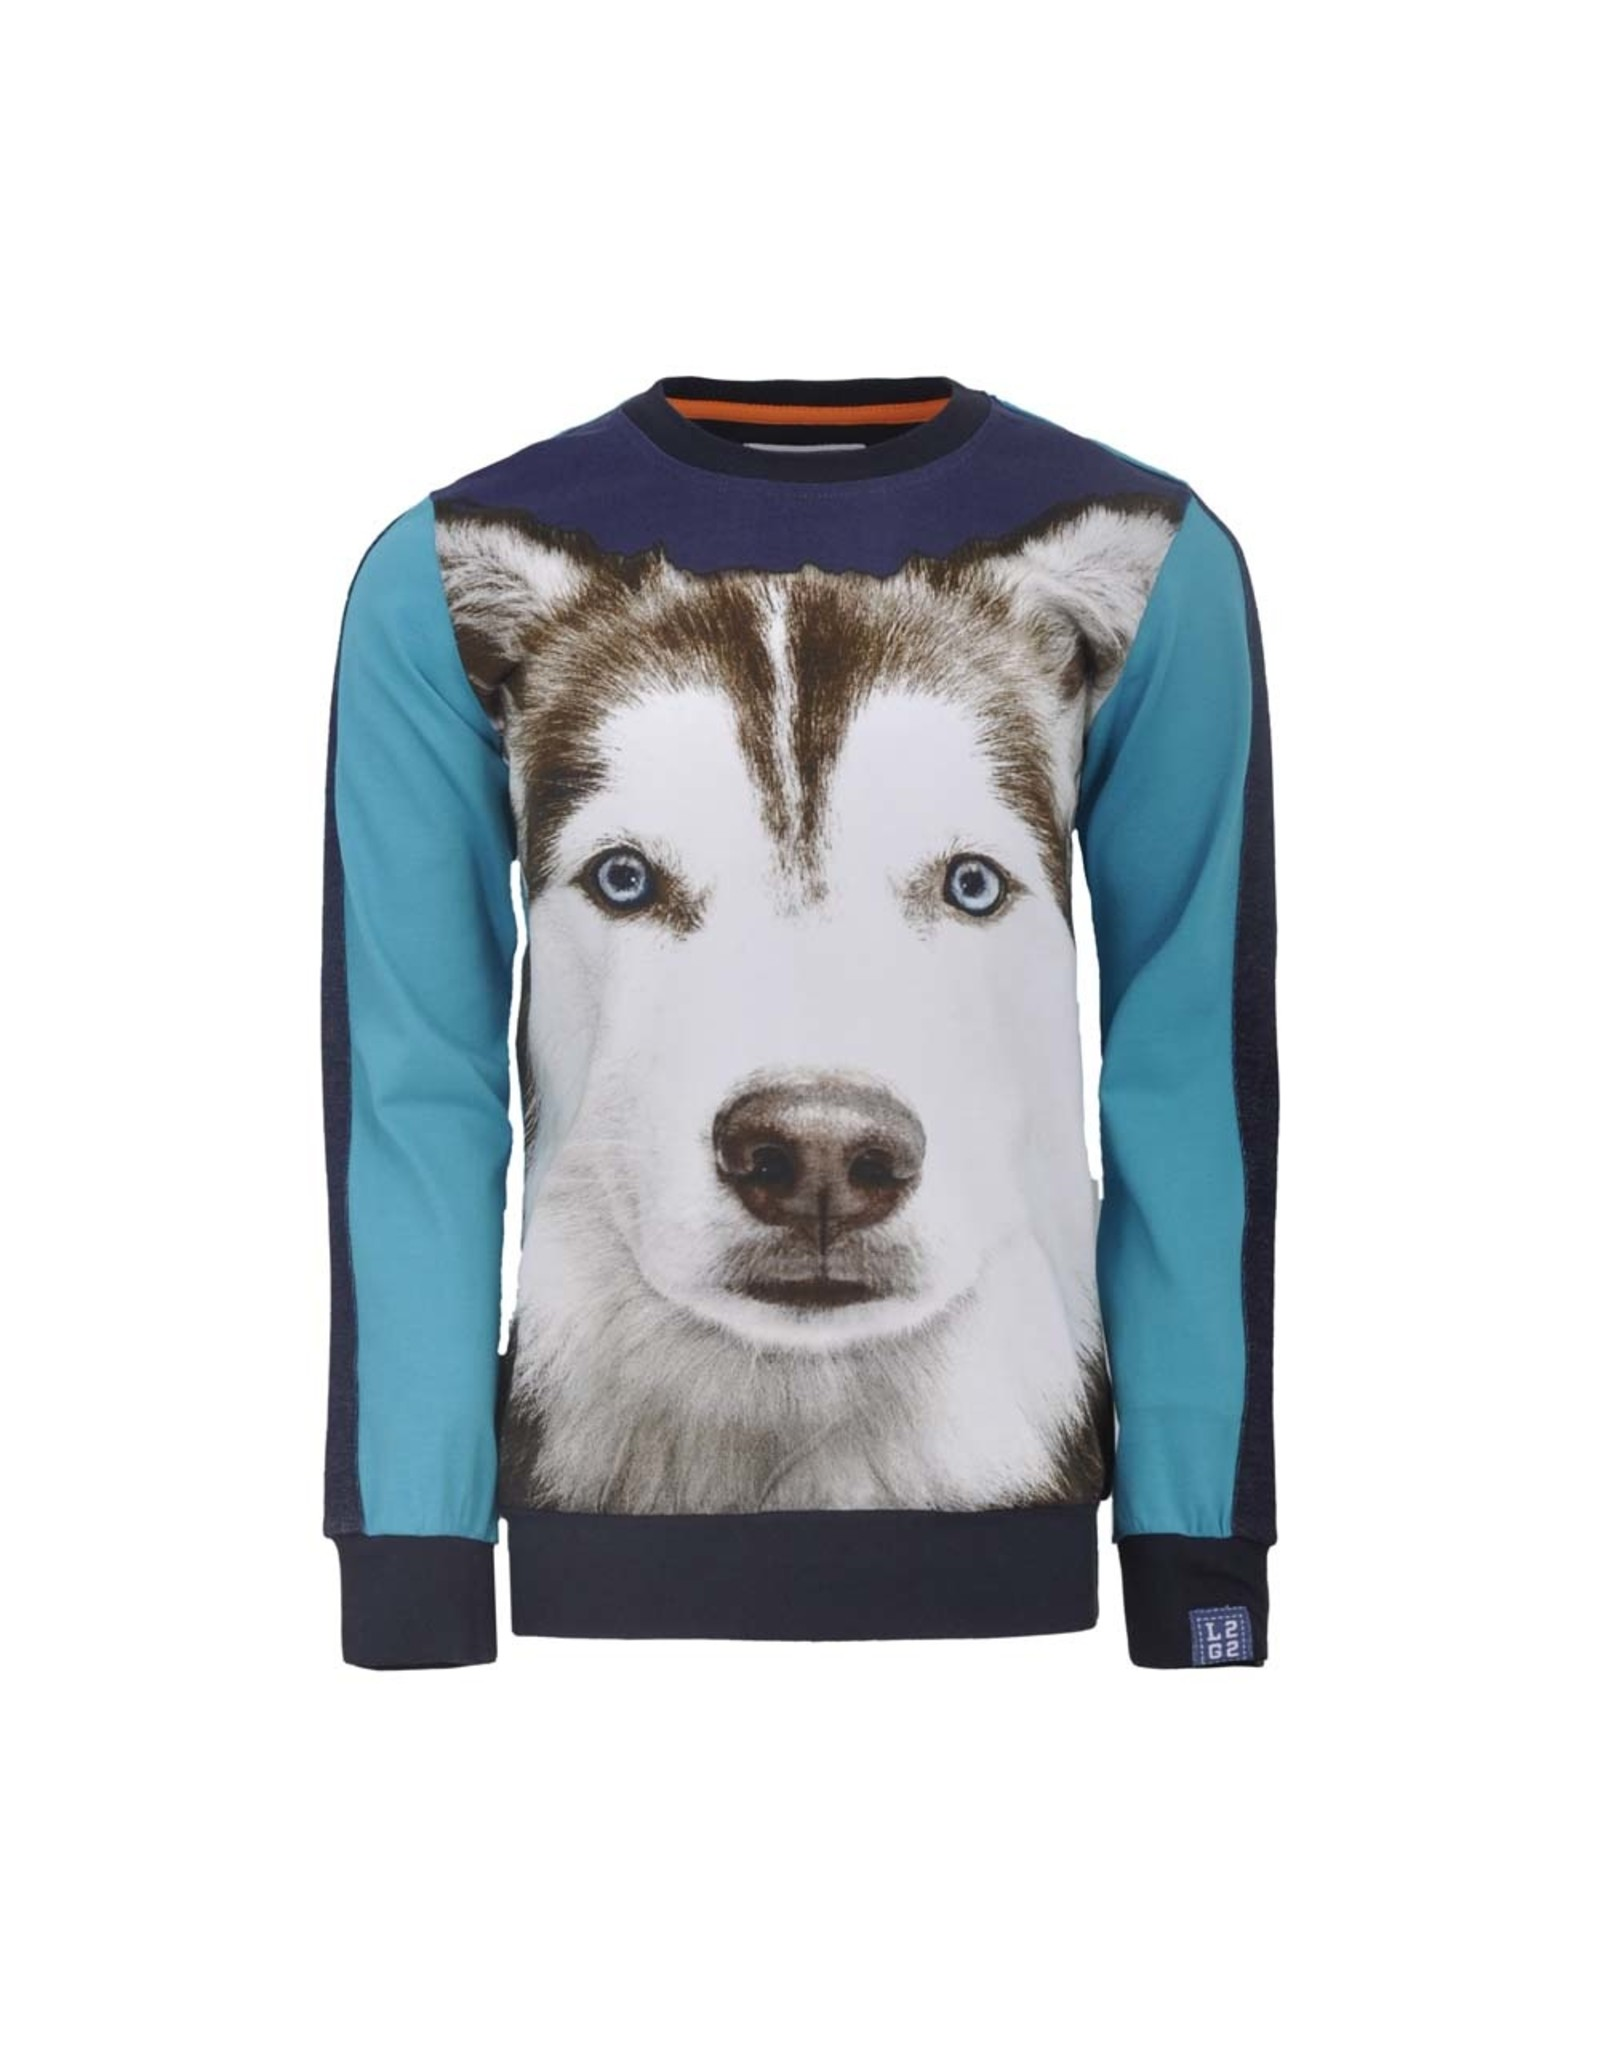 Legends Legends jongens sweater Hugo Blue Tile